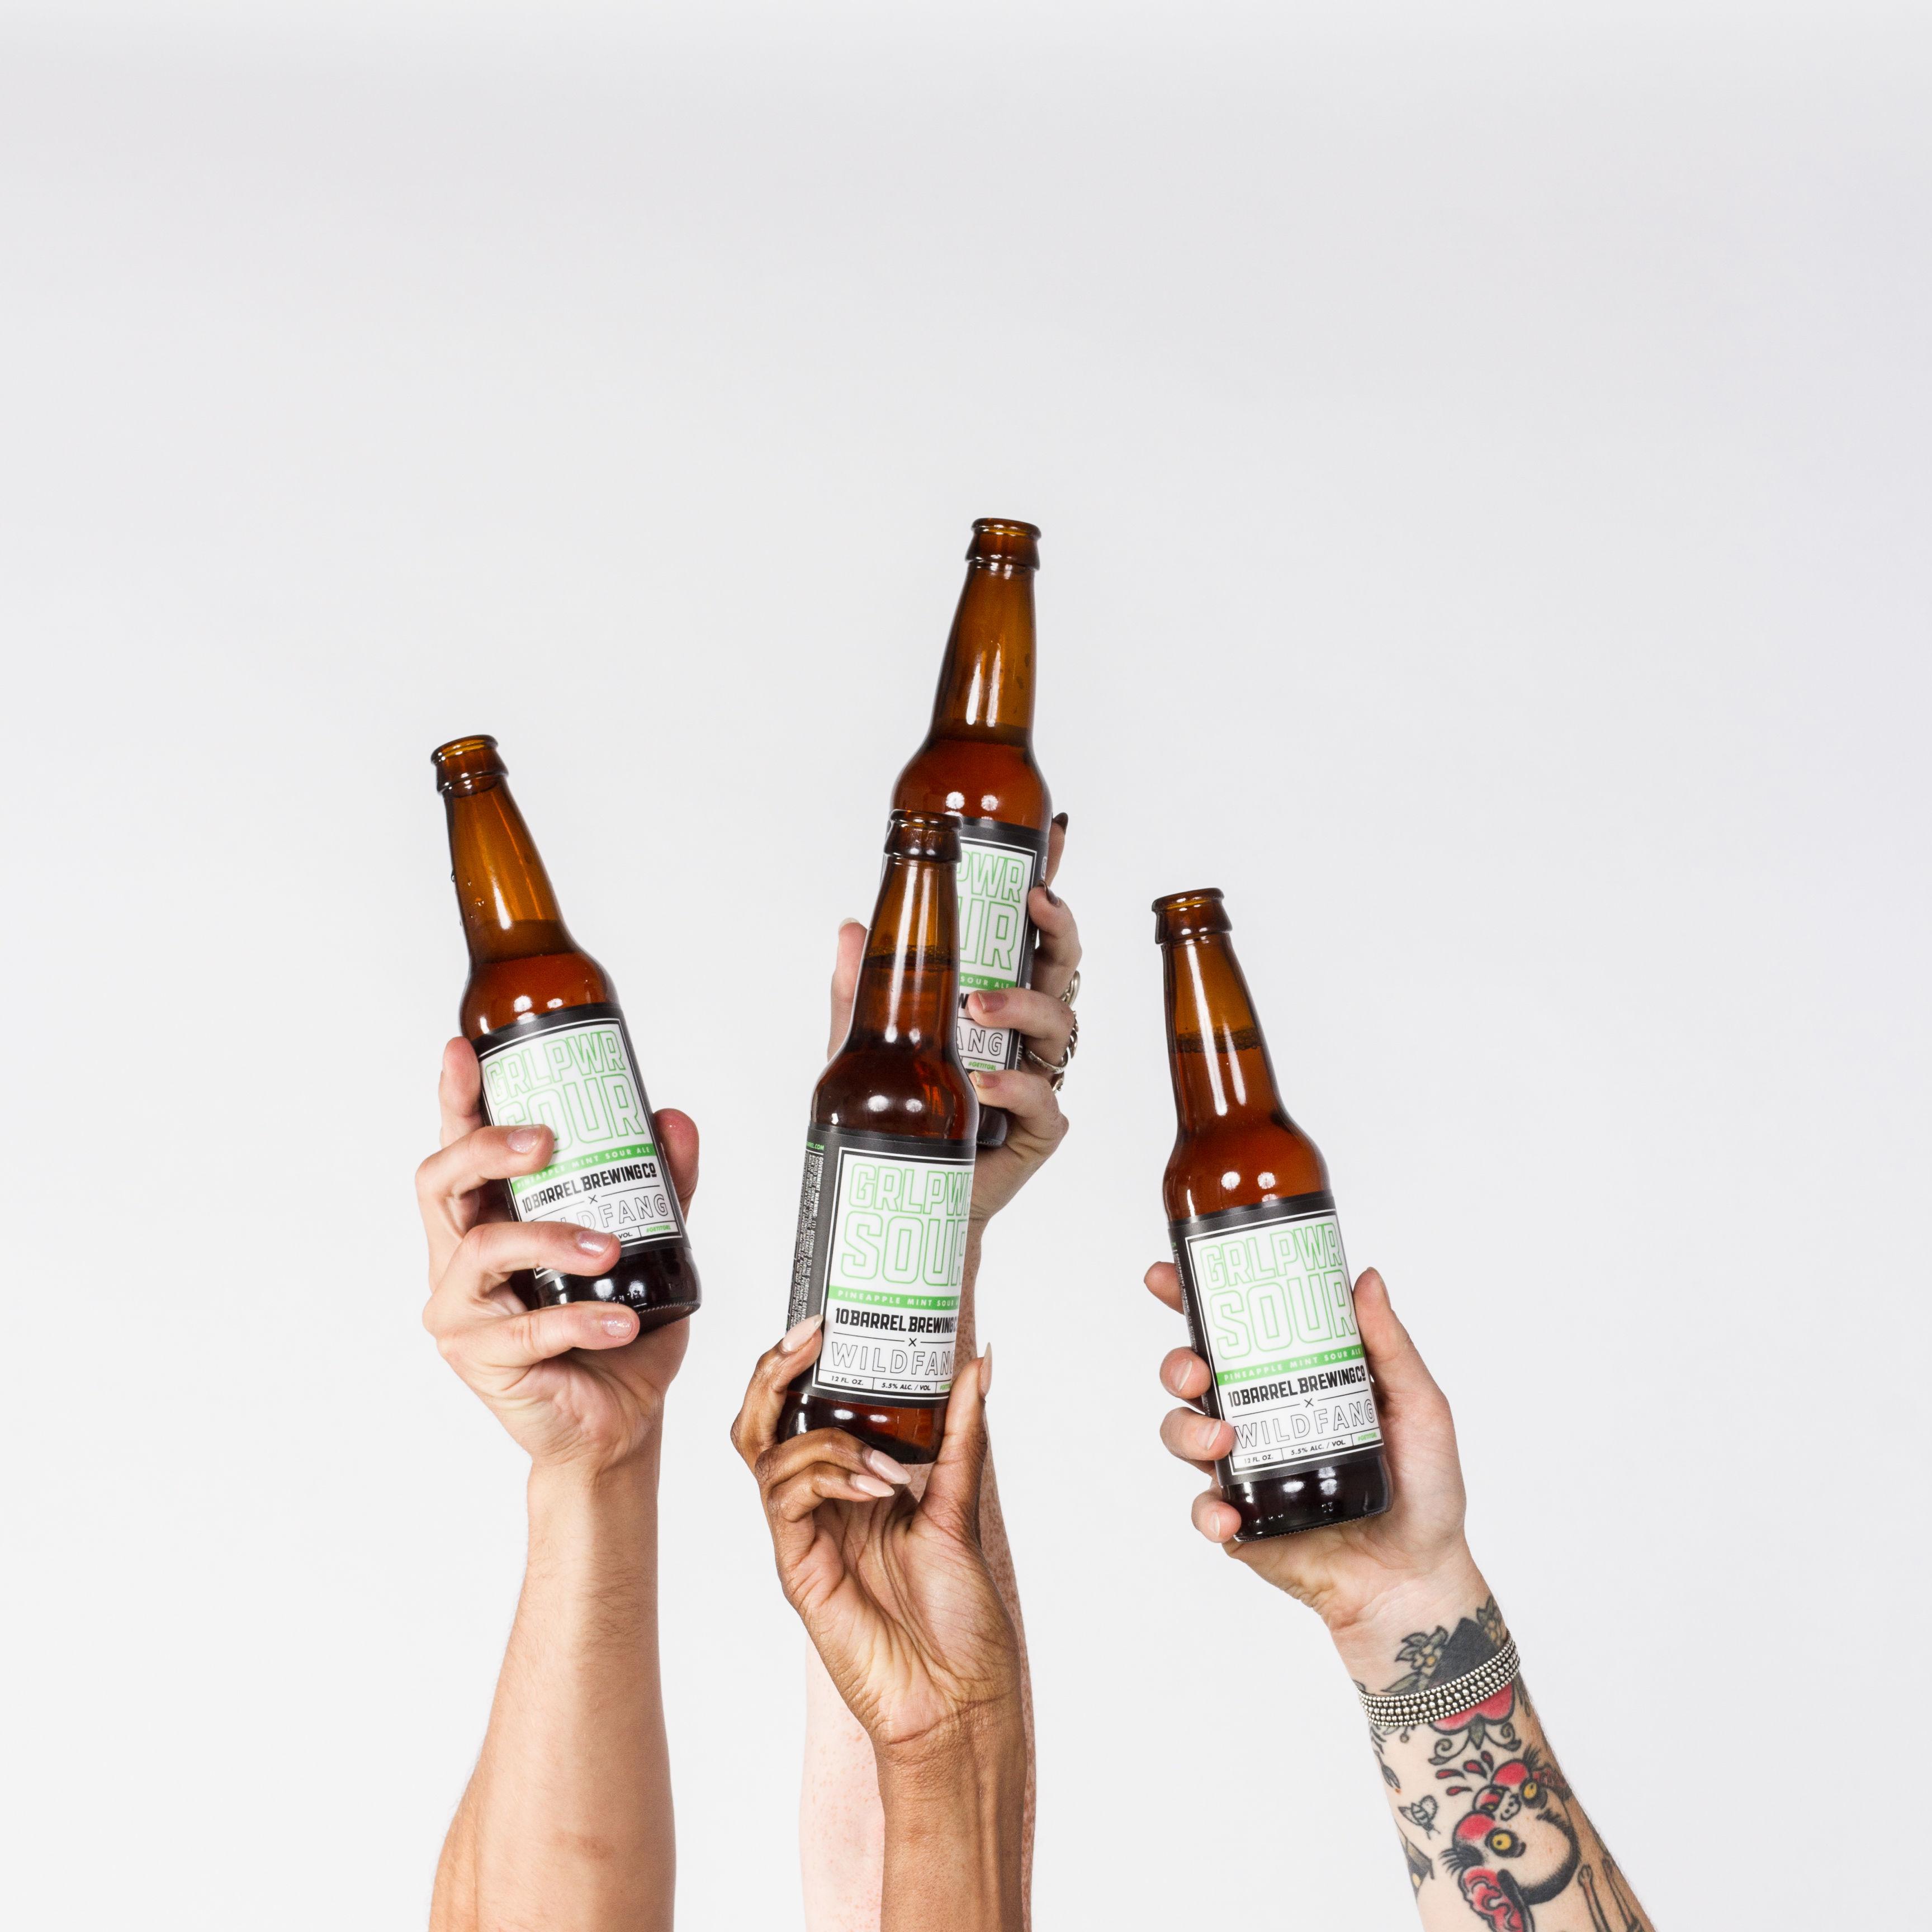 Wildfang x 10 barrel beer grl pwr sour lgb0vt